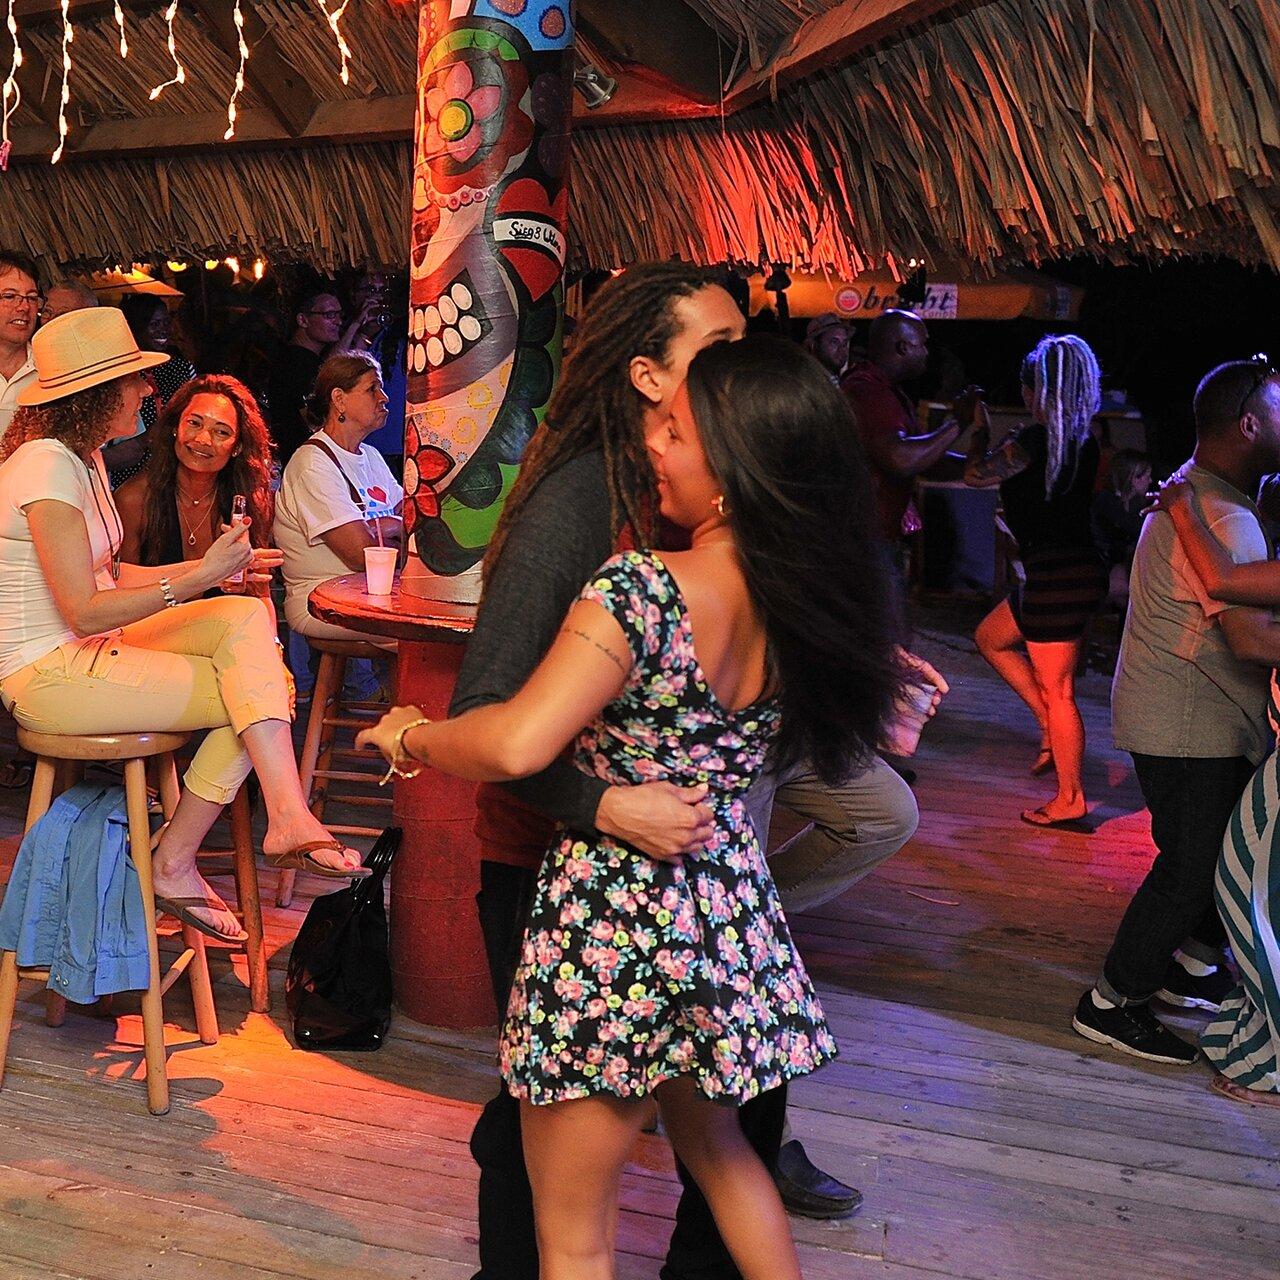 Clubs in Aruba - Best Nightclubs & Dancing in the Caribbean